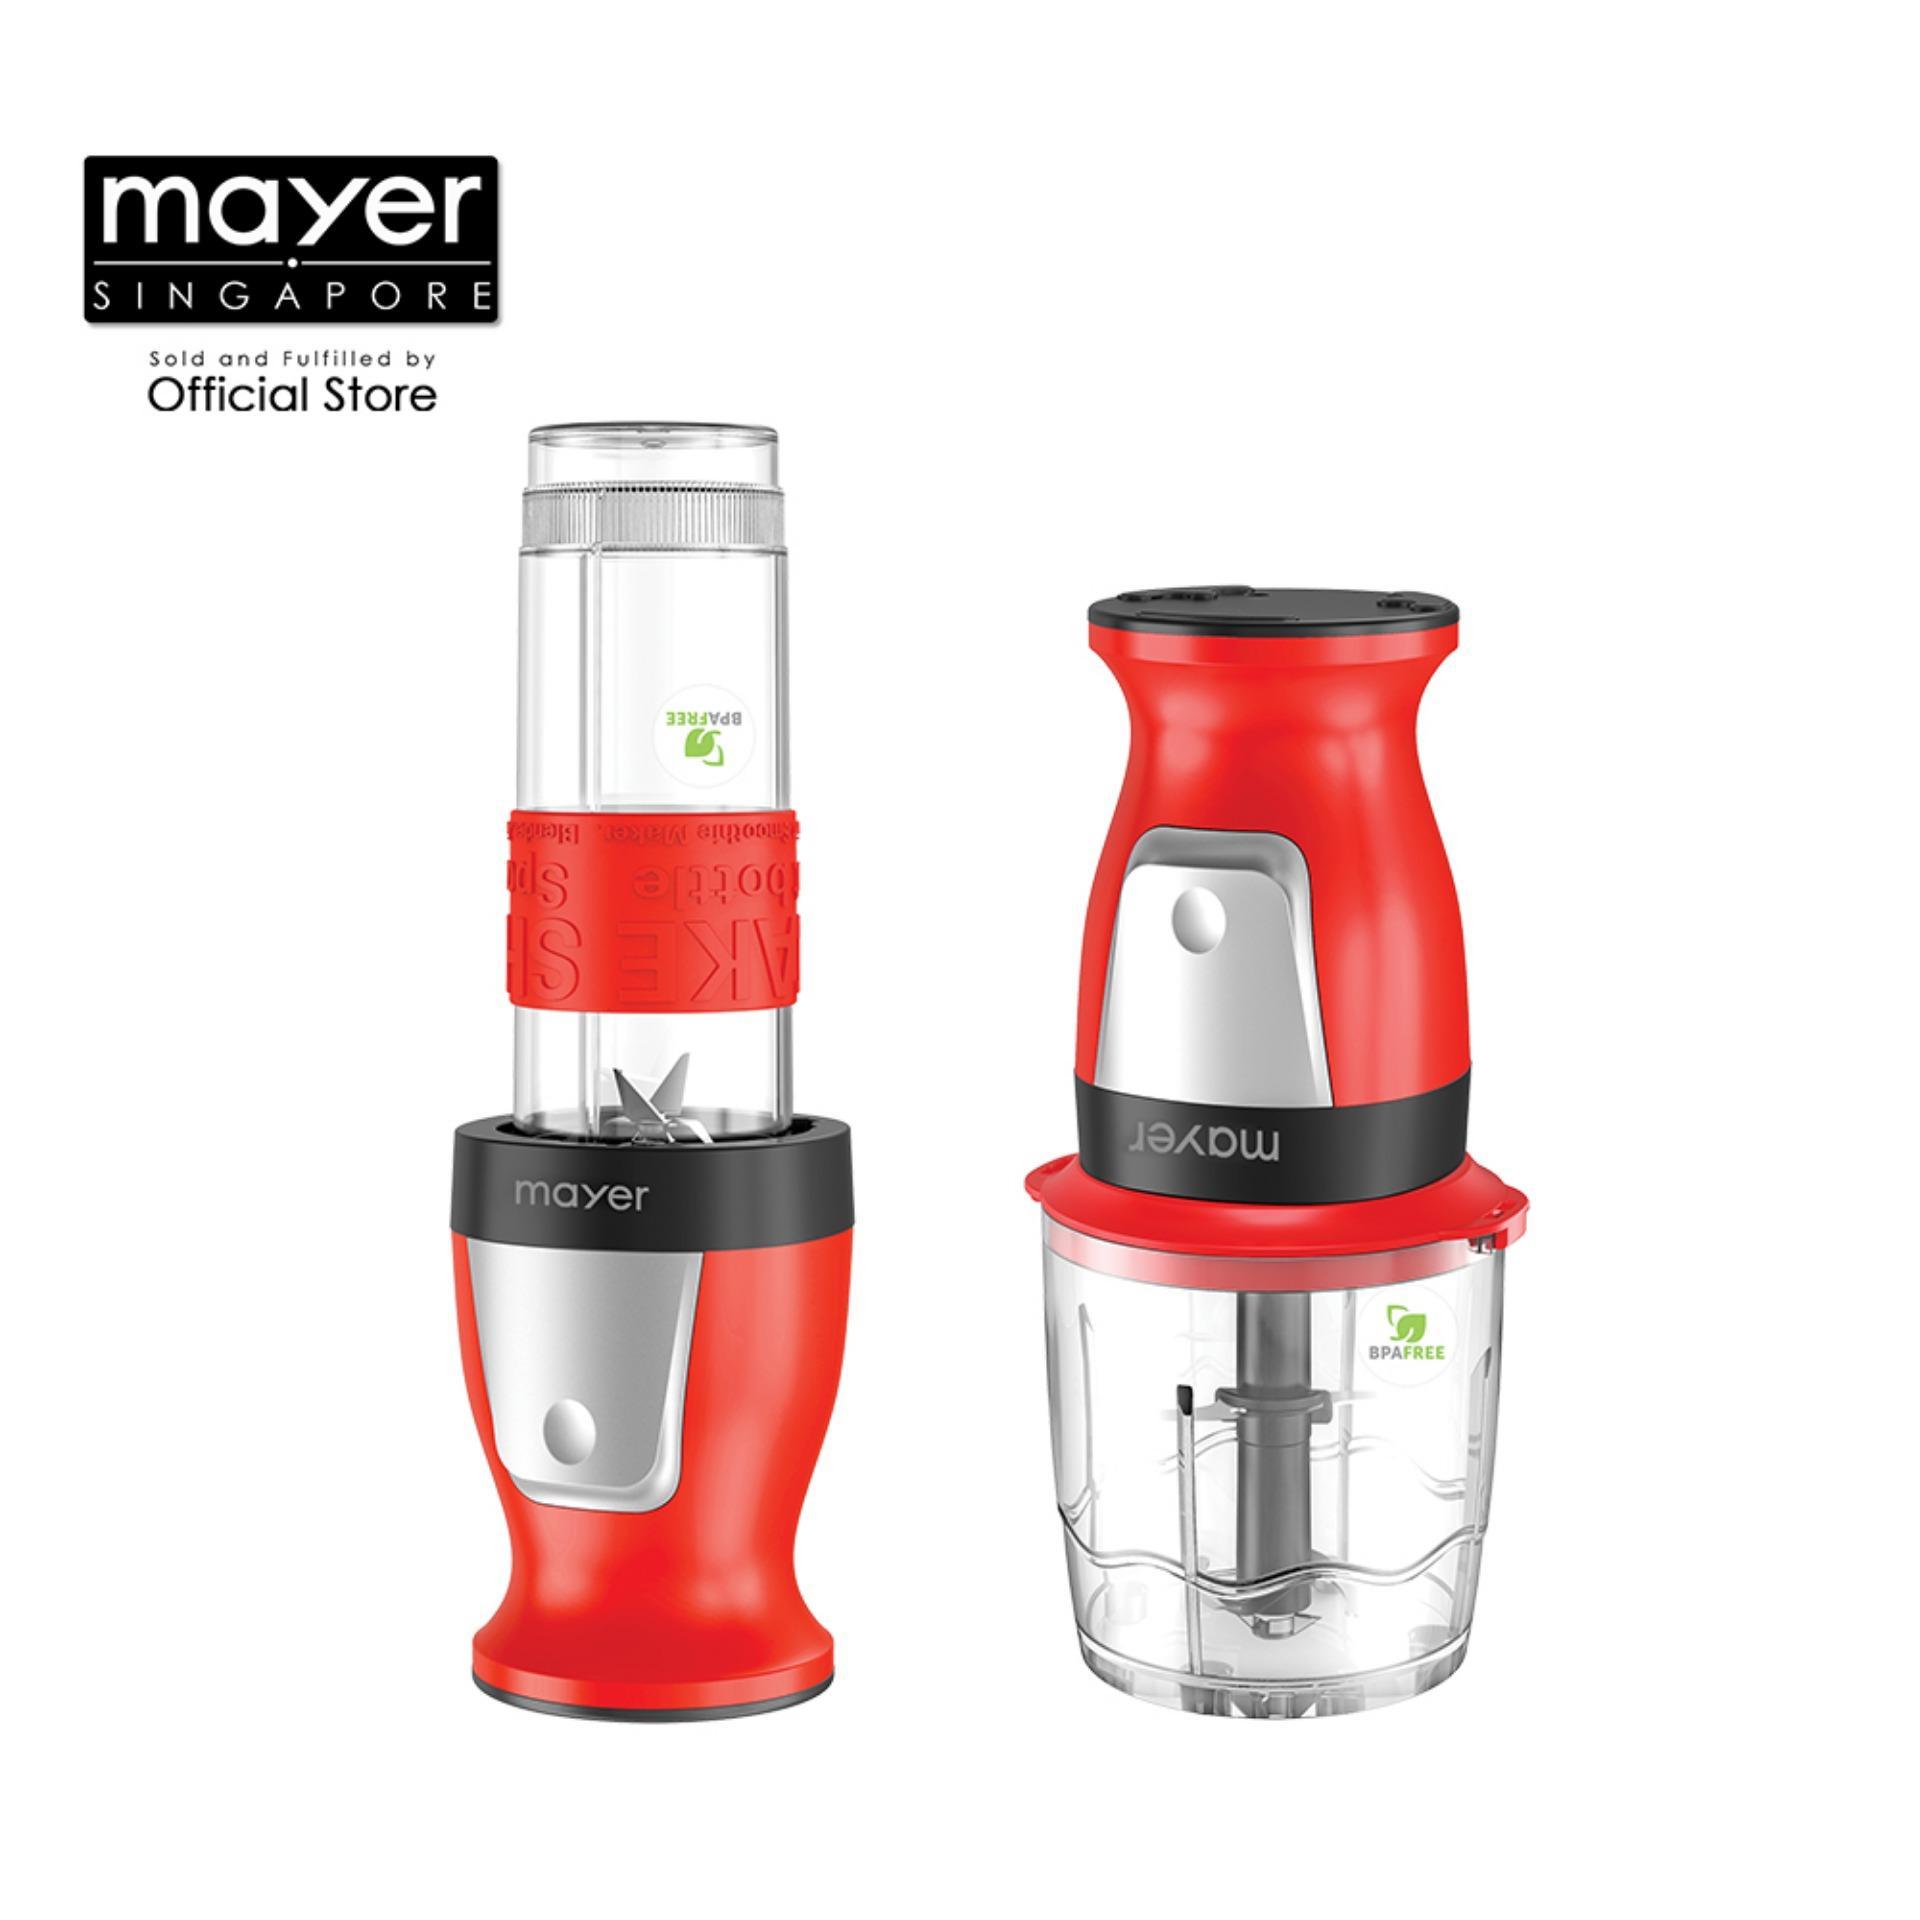 Mayer 2 in 1 Blender and Chopper (MMBC19)/600ml blender/1L chopper